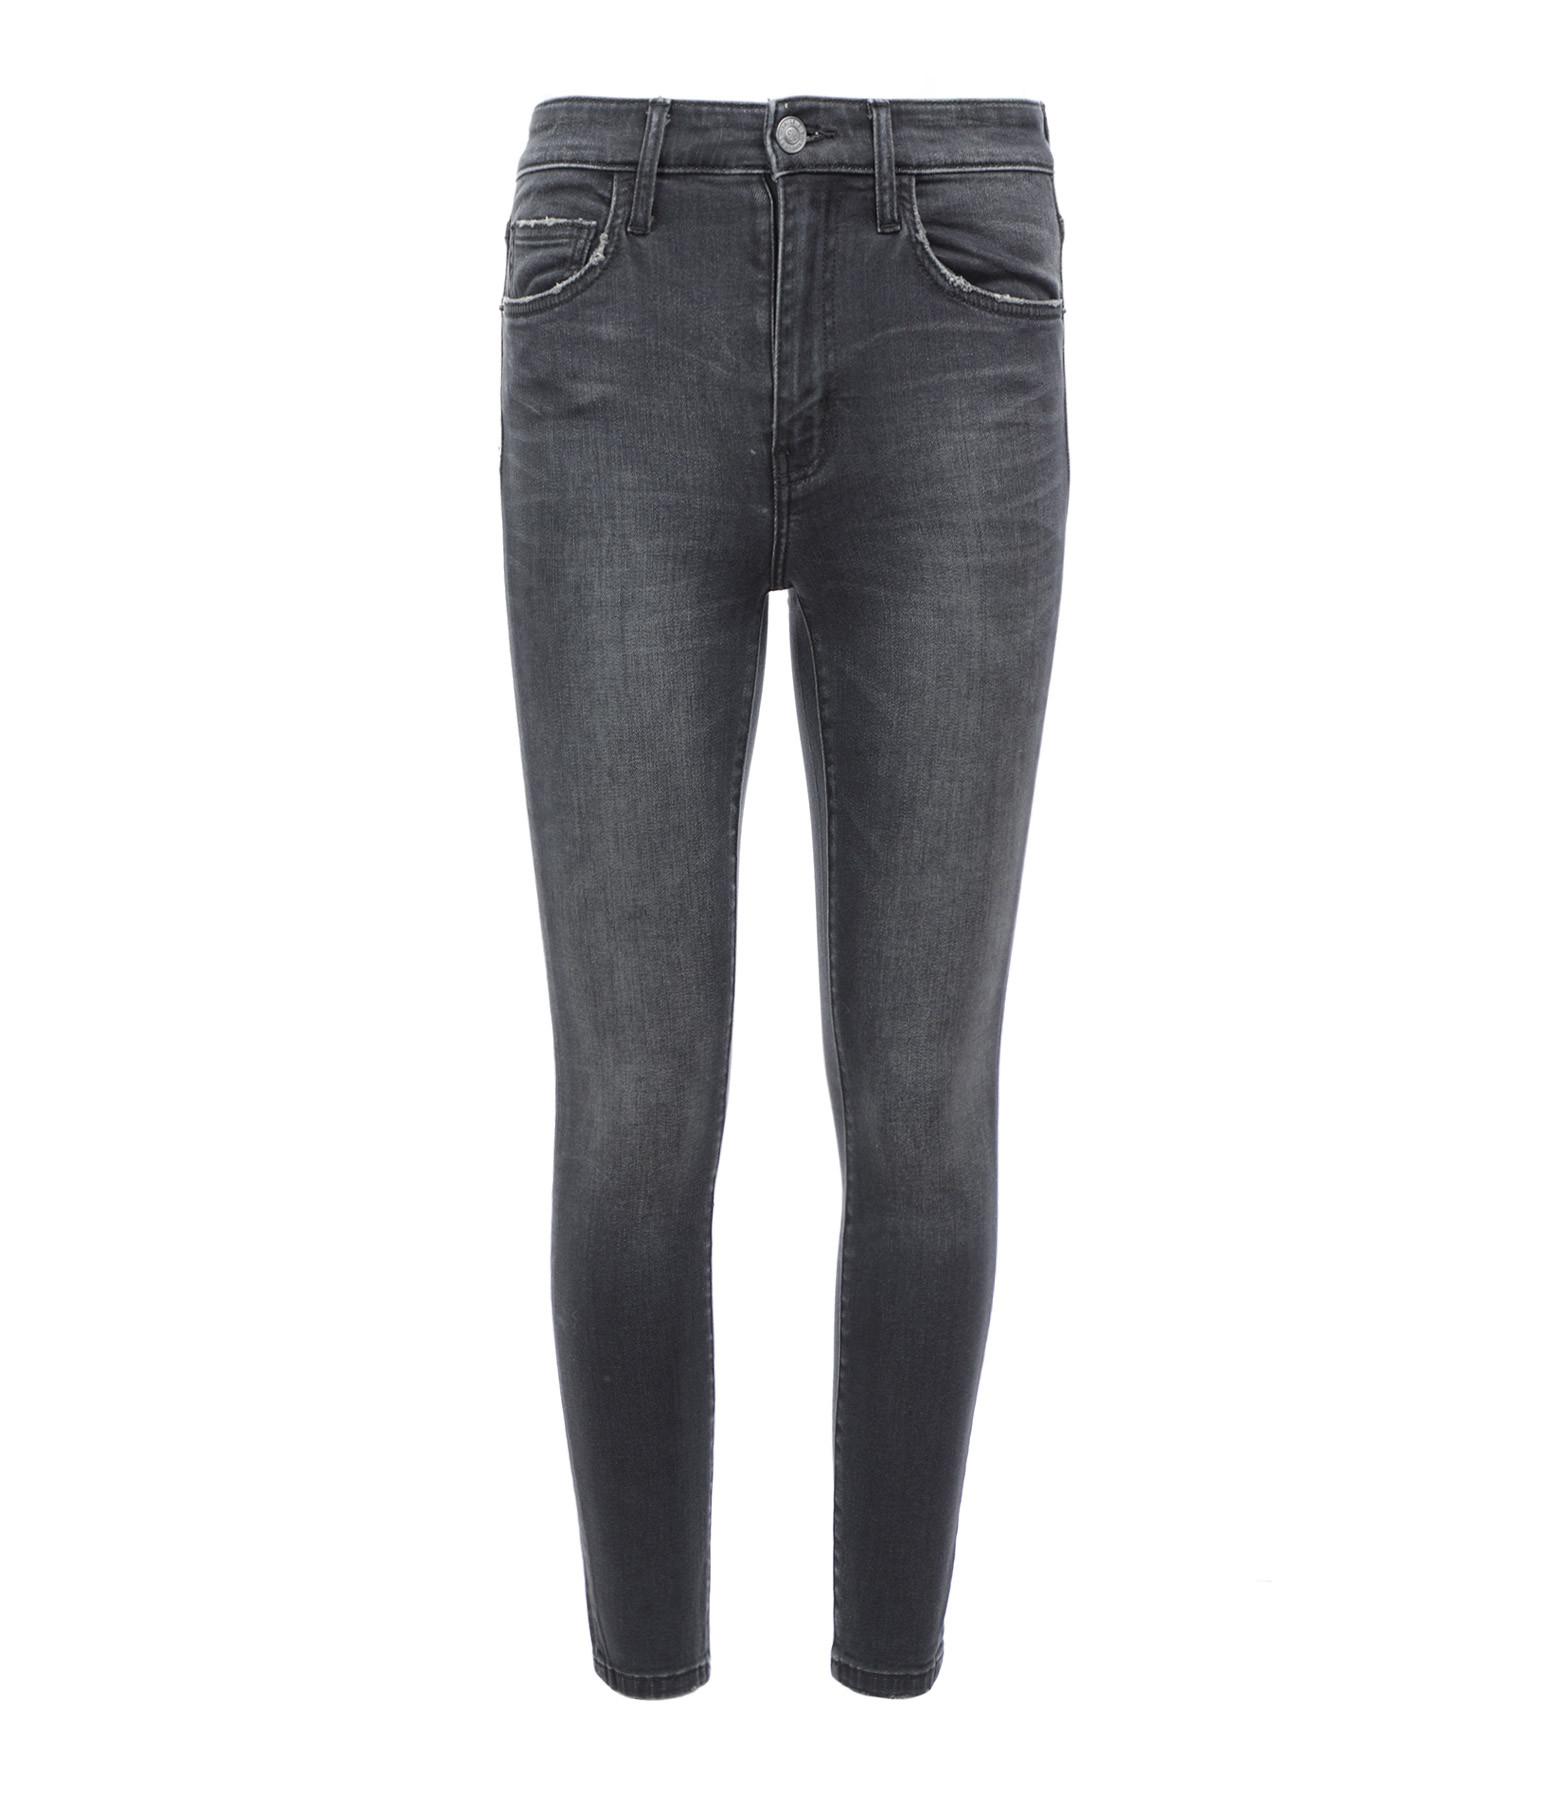 CURRENT/ELLIOTT - Jean The Original High Waist Ankle Stiletto Noir